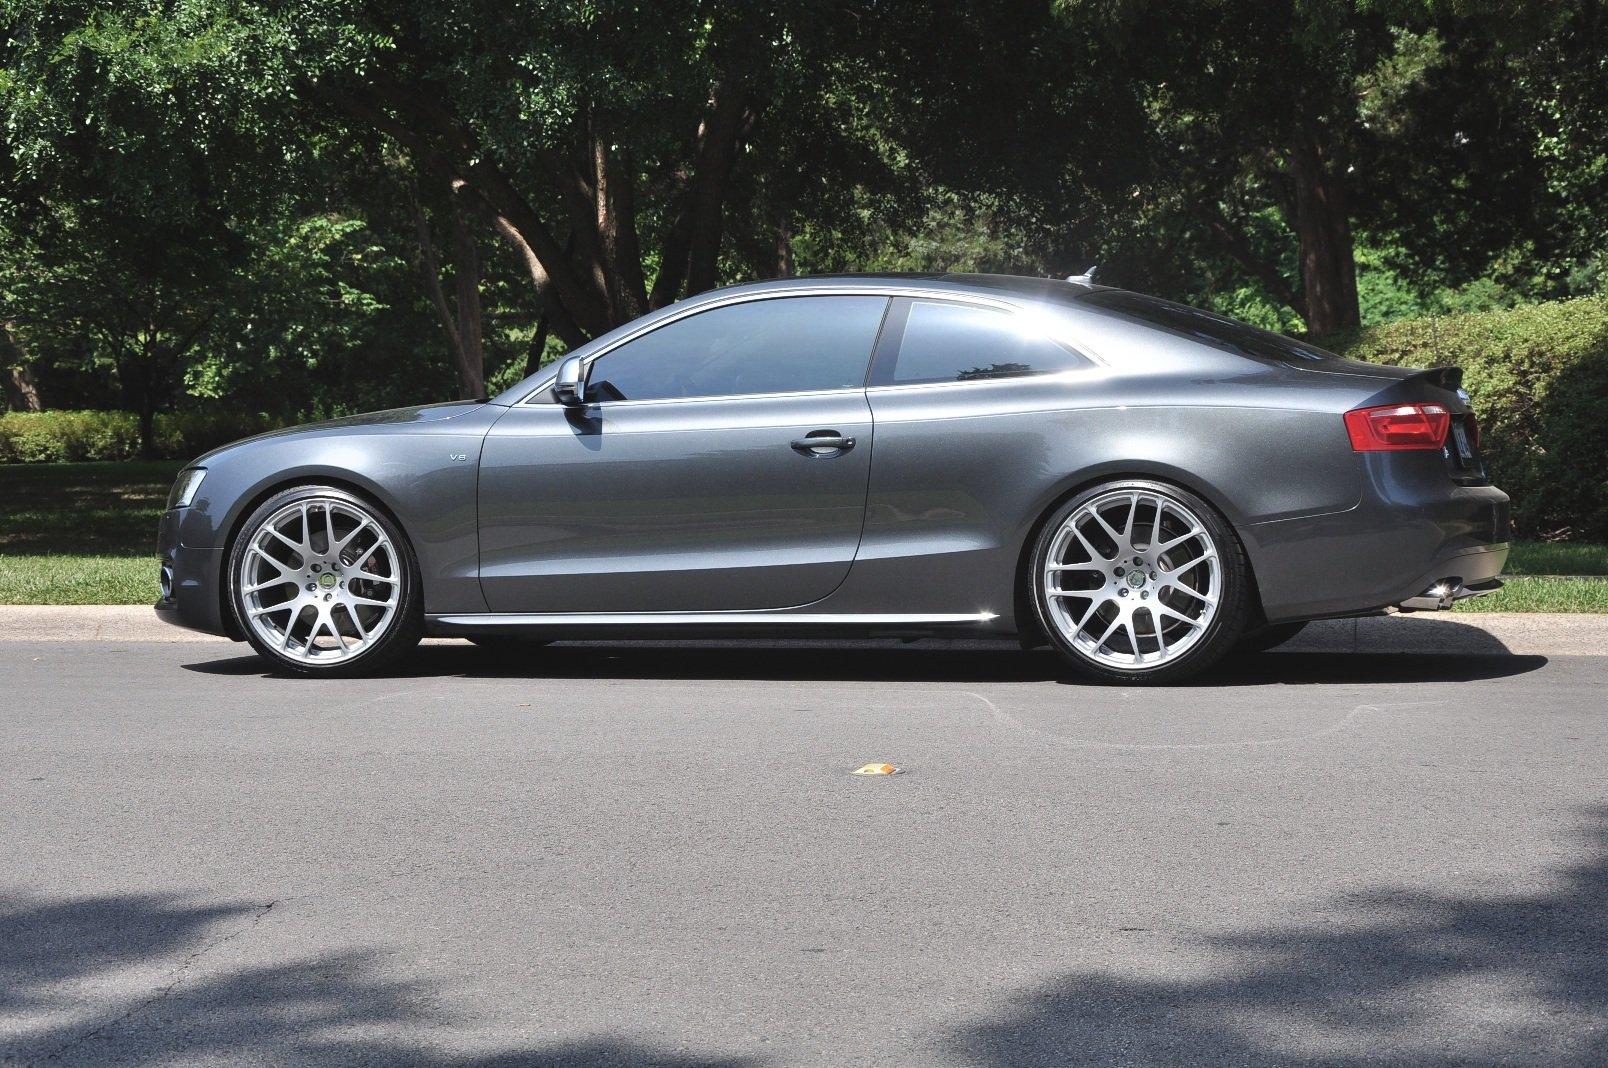 Daytona Gray, HRE P40 and KW V2 - Audi A5 Forum & Audi S5 Forum on audi a6 gletscherwei, audi a6 glacier white metallic, audi a6 ibis white, audi a6 ice silver metallic, audi a6 black, audi a6 moonlight blue metallic,